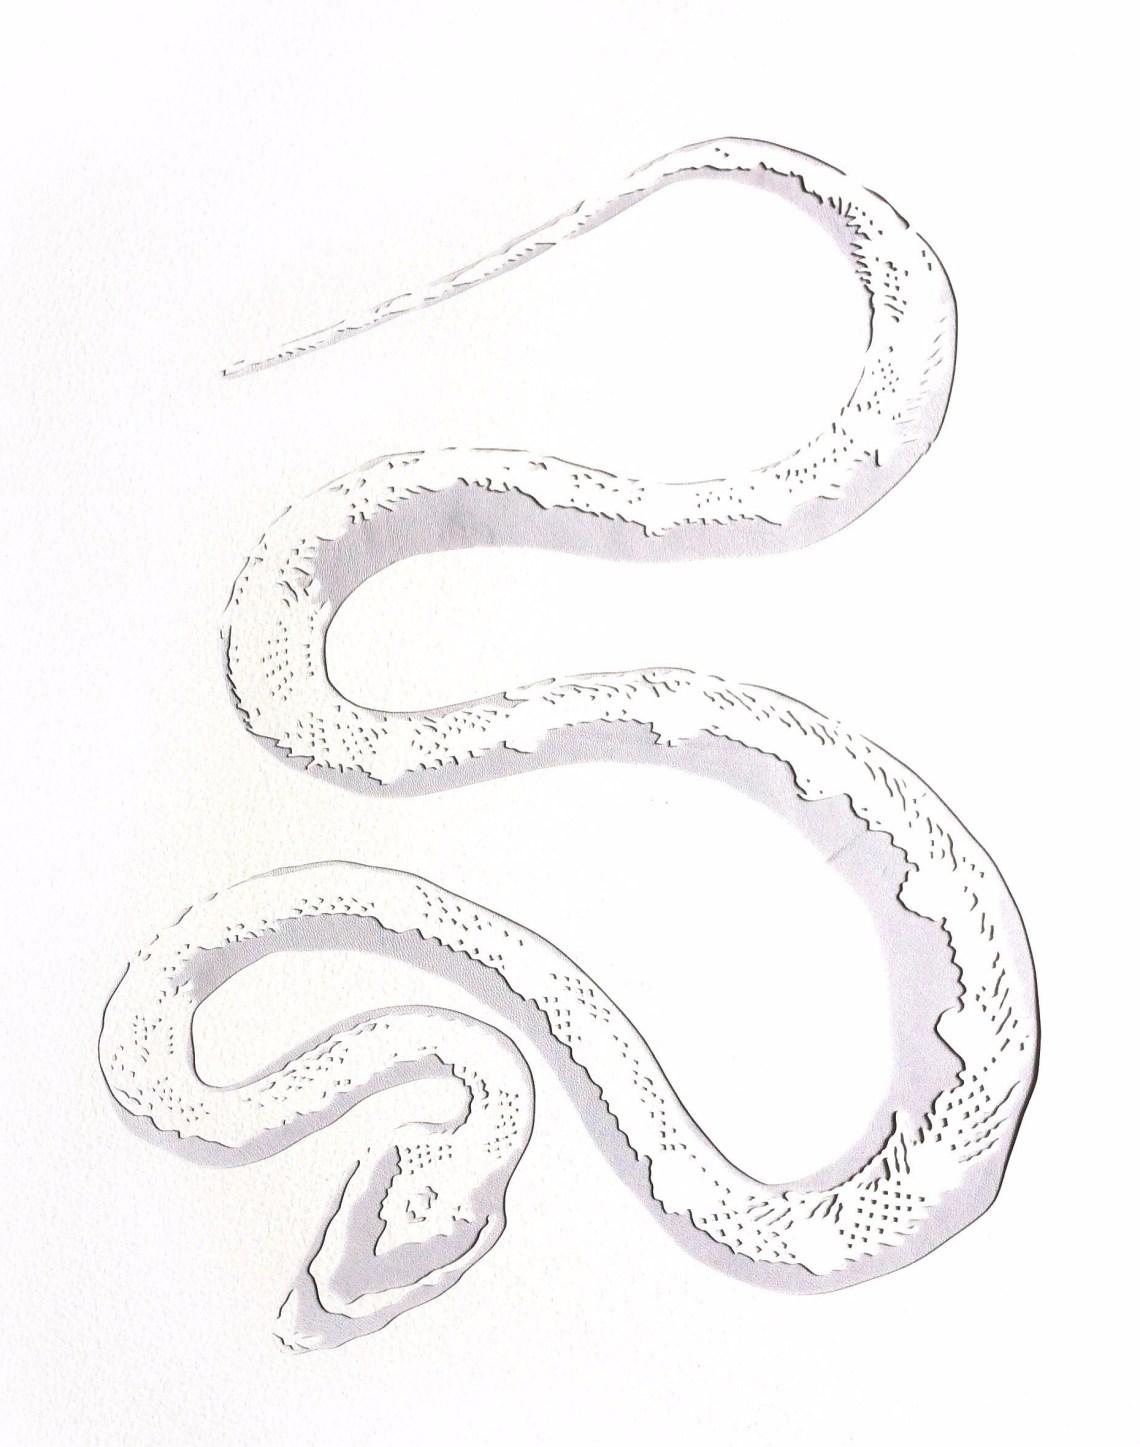 snake-abbey-kayte.jpg